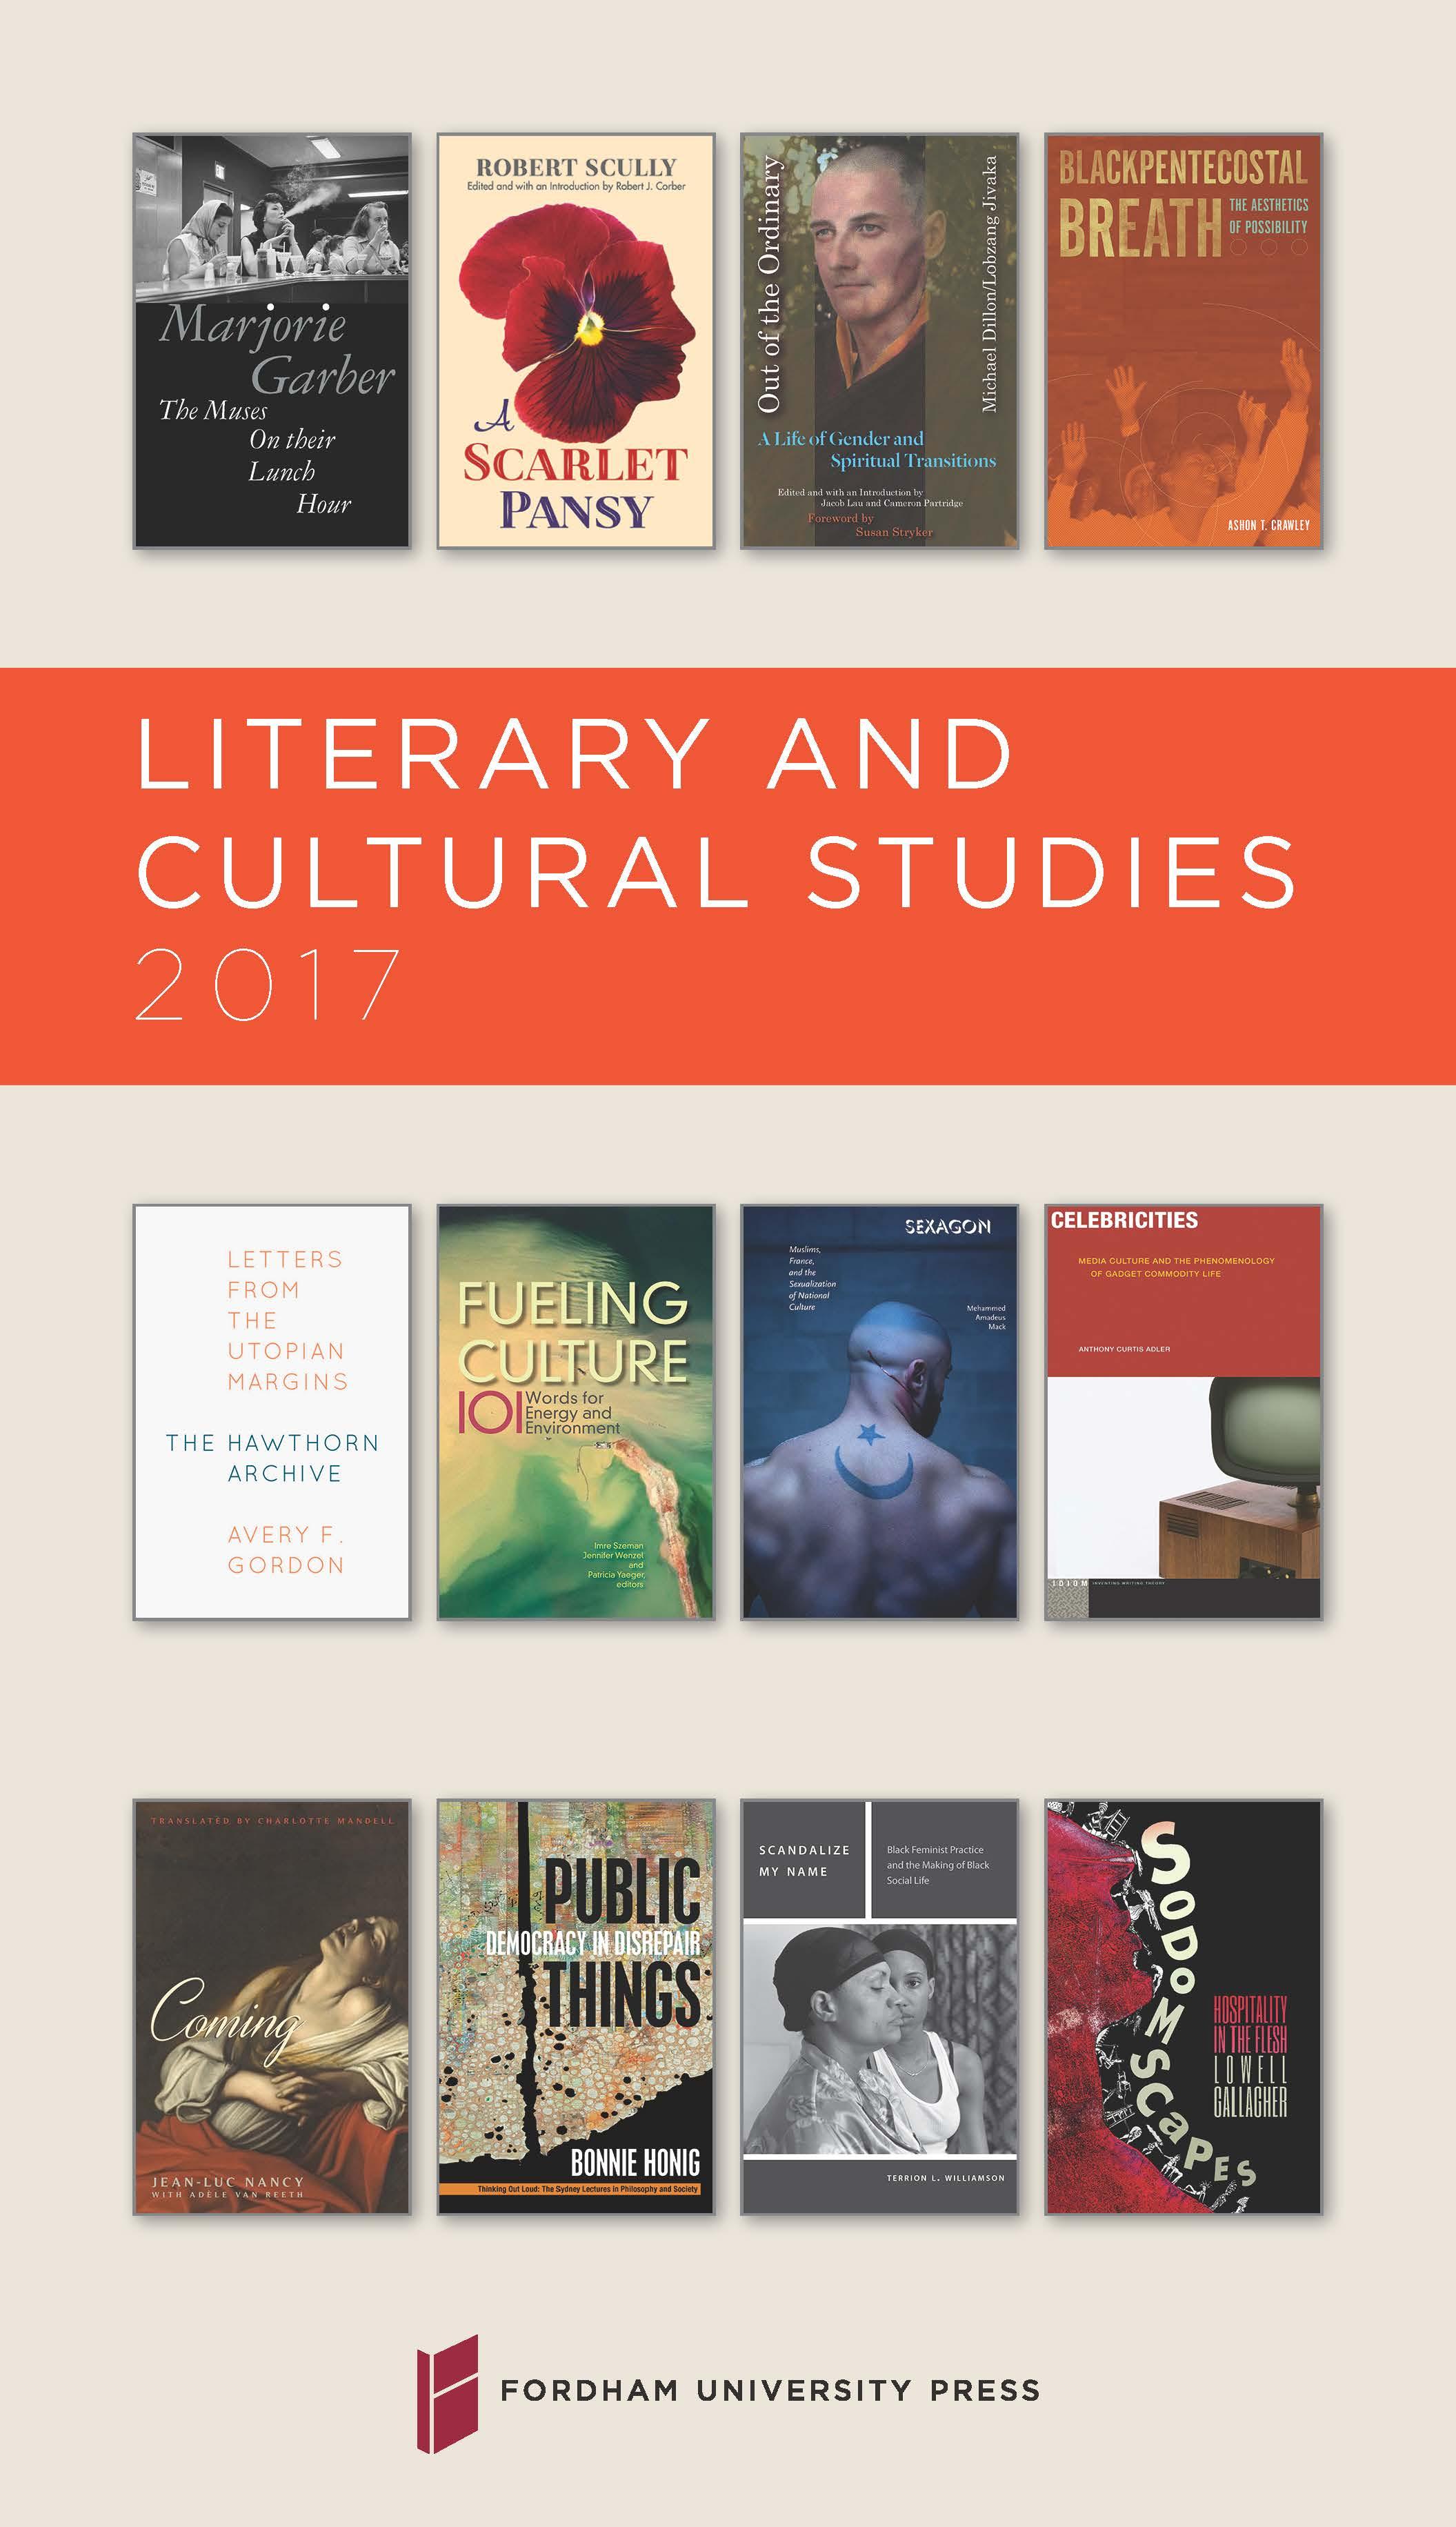 Literary & Cultural Studies 2017 Brochure